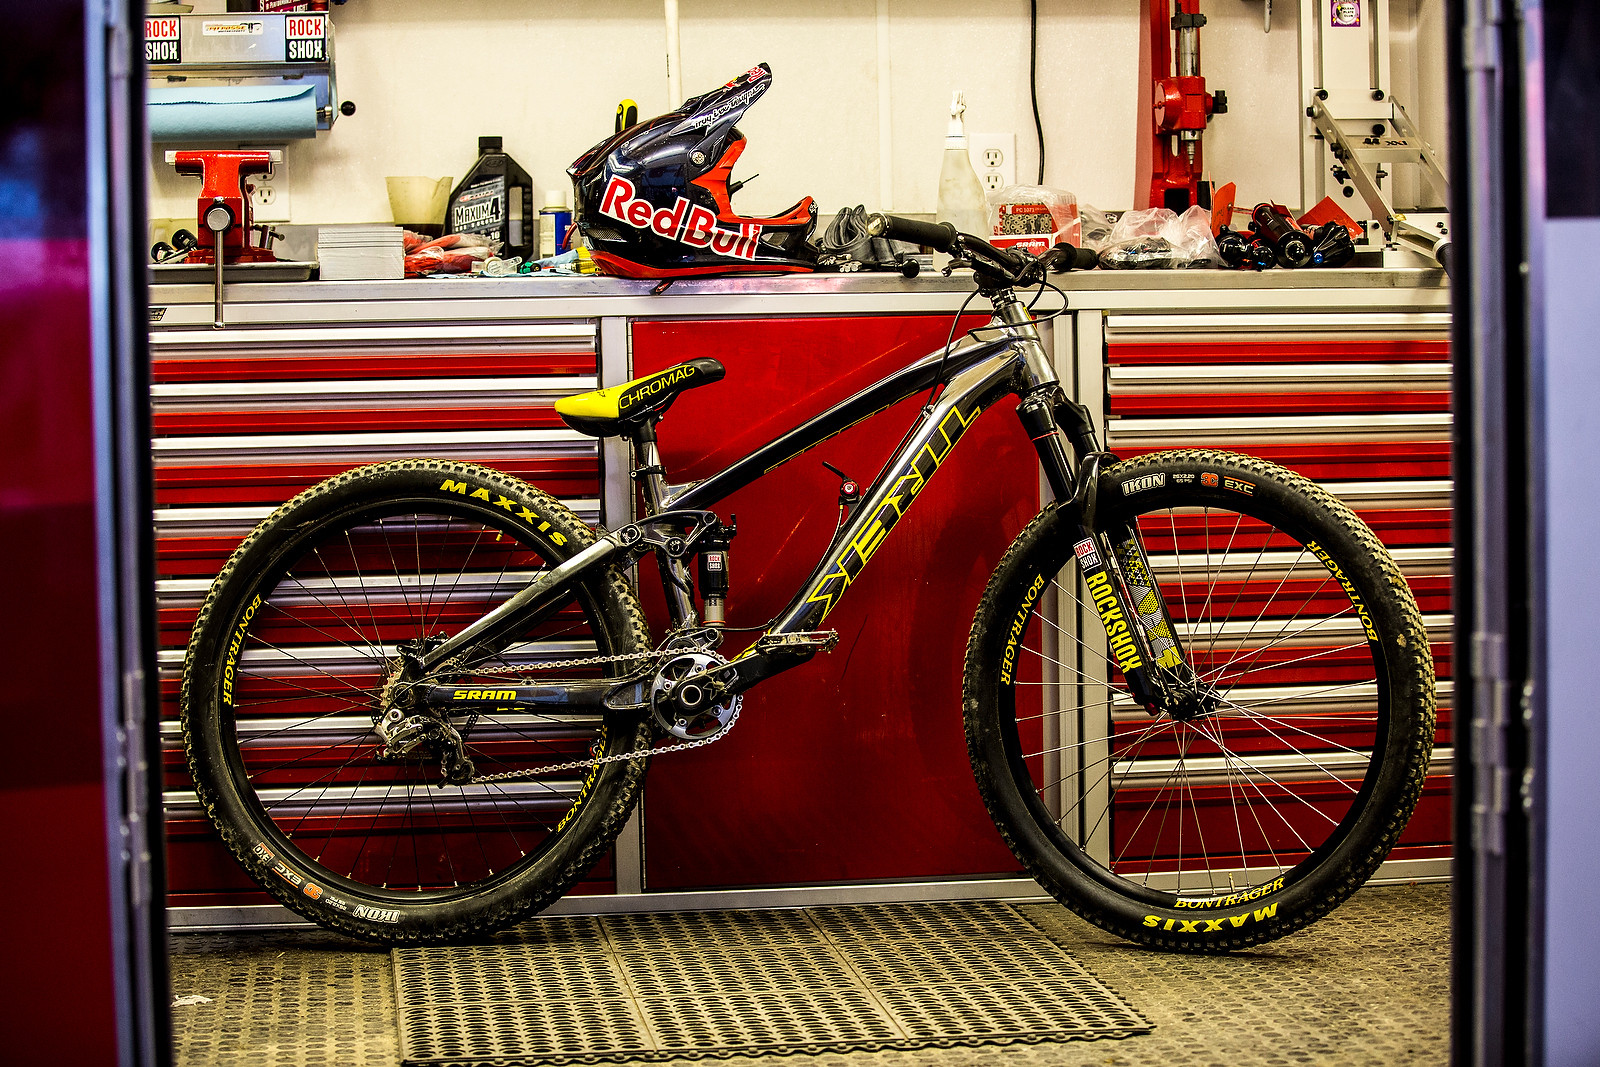 Brandon Semenuk's Winning Bike and Red Bull Joyride Run - Winning Bike: Brandon Semenuk's Trek Ticket S - Mountain Biking Pictures - Vital MTB